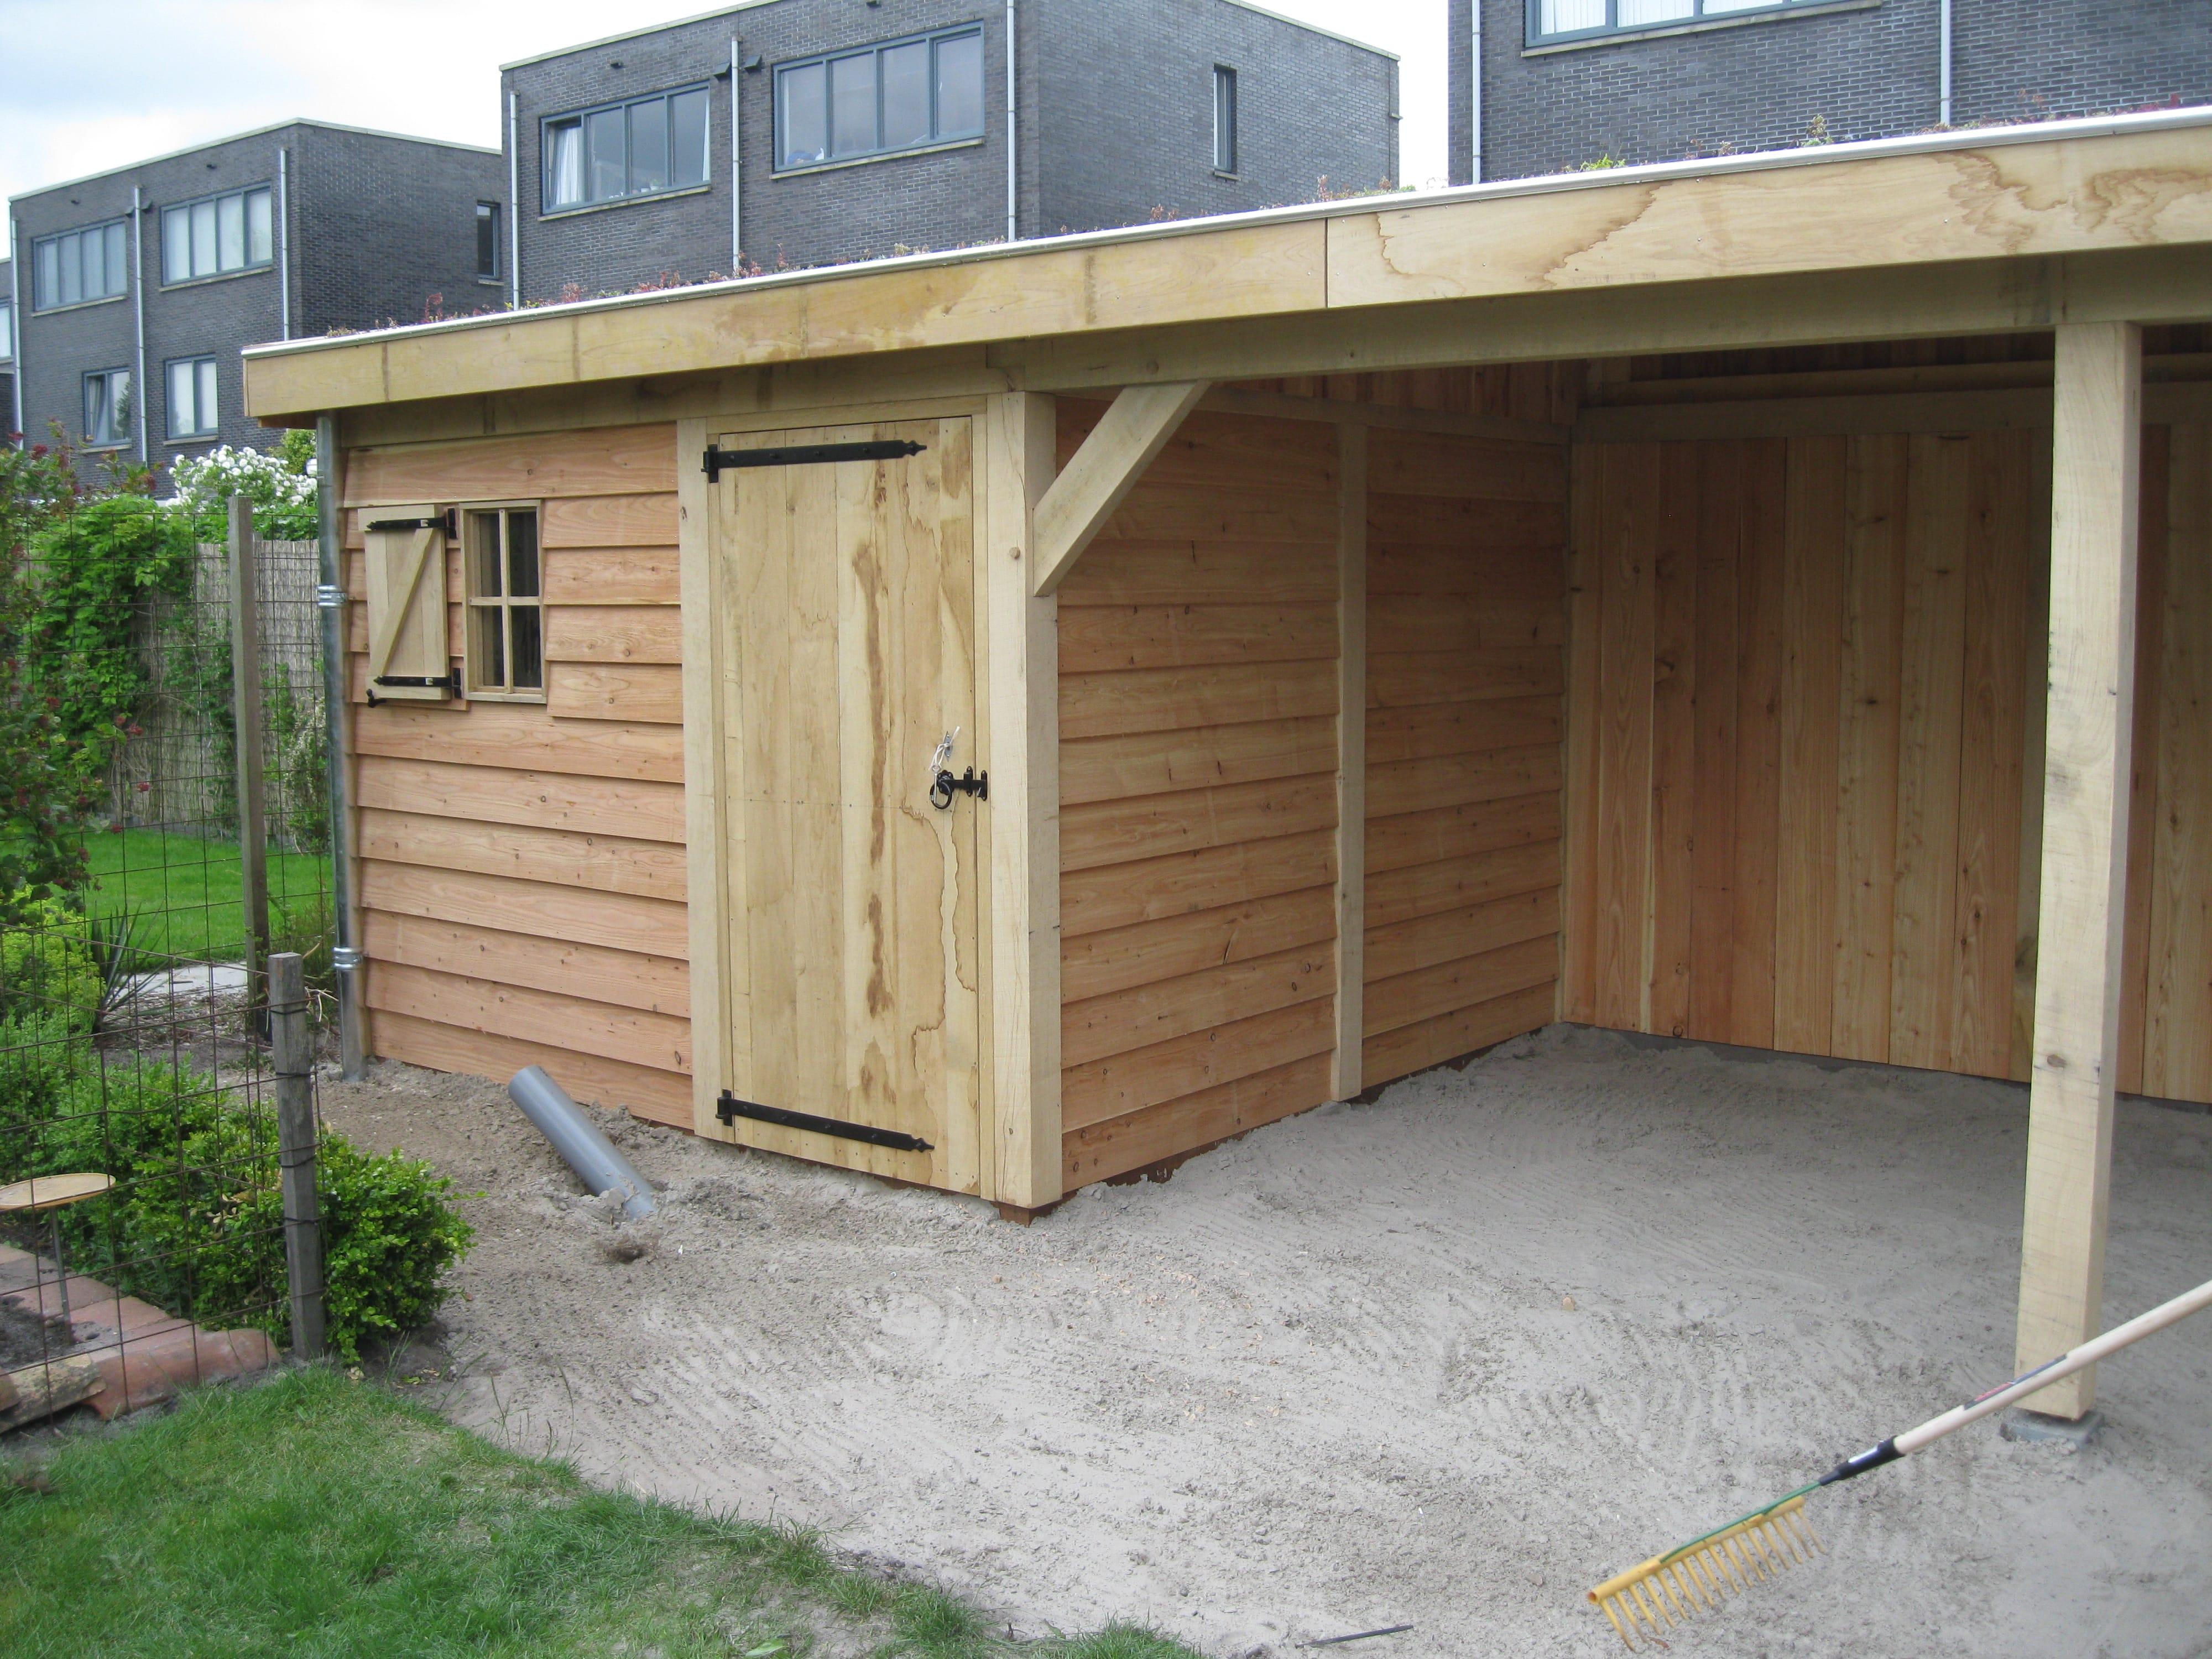 Houten-tuinhuis-met-tuinkamer-groendak-7-min - tuinhuis met veranda 'groendak'